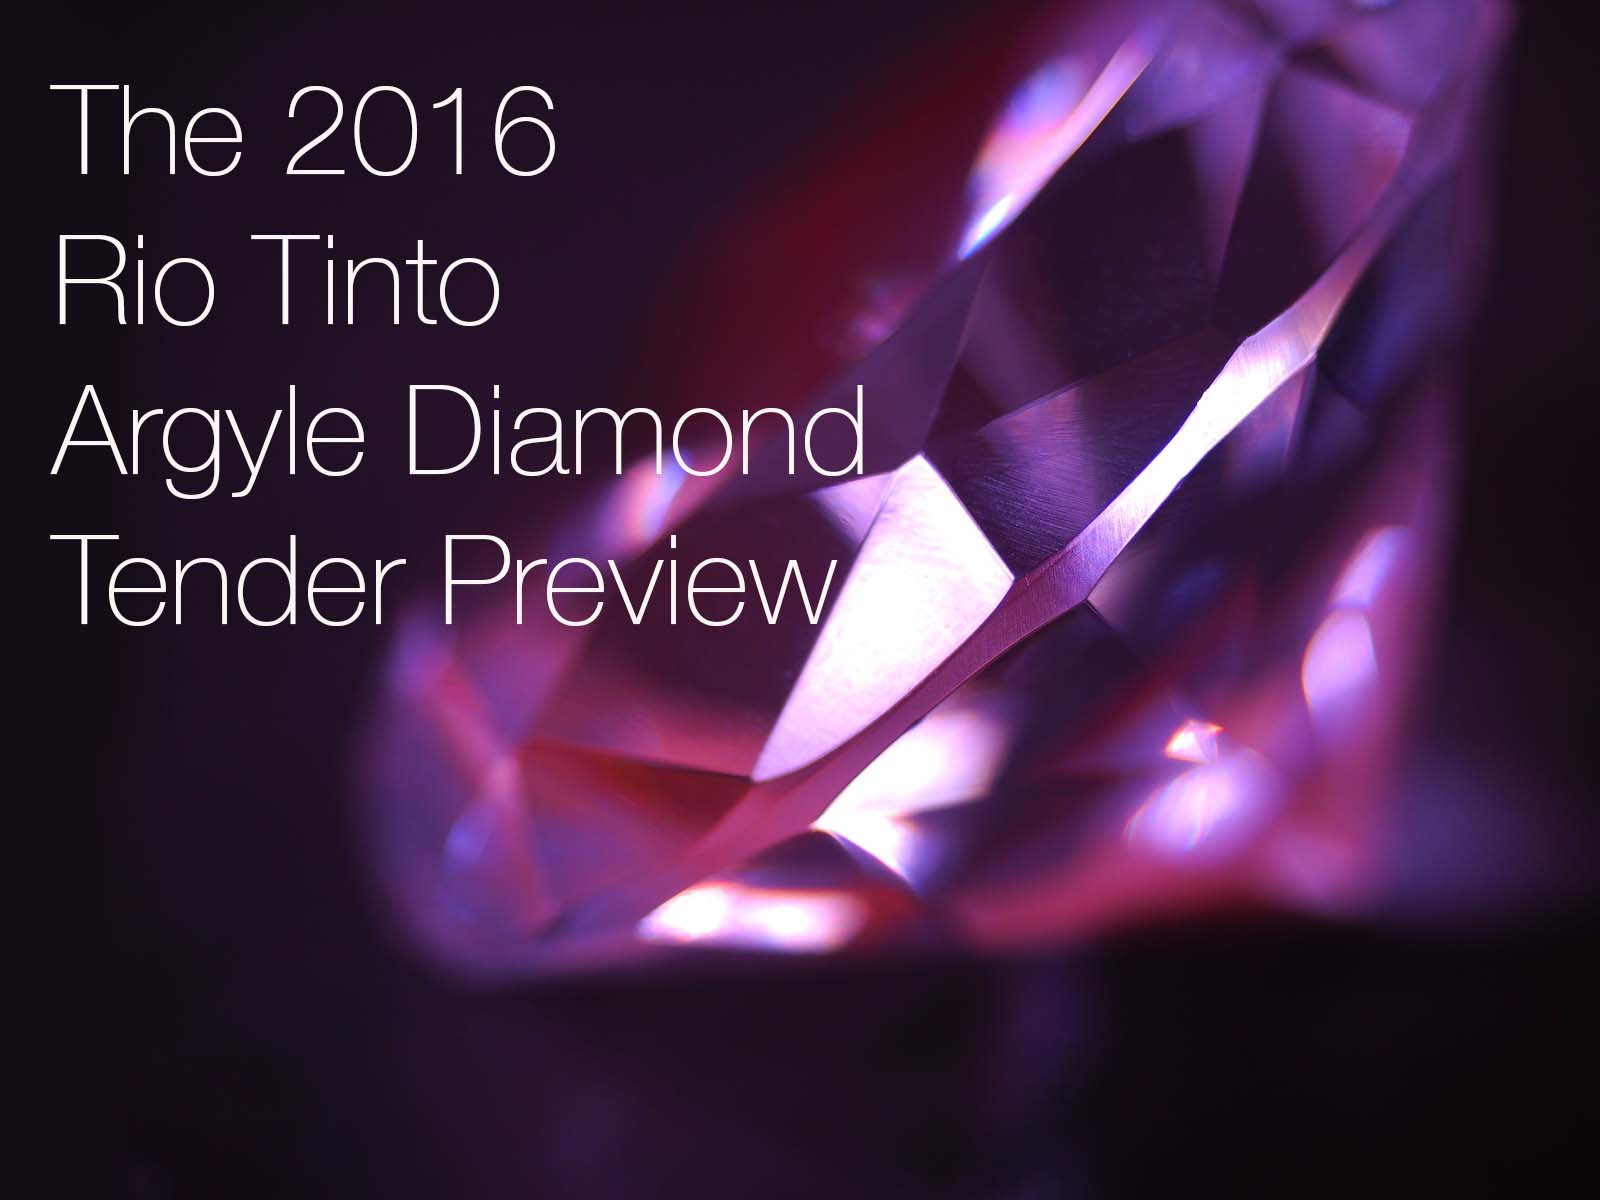 2016_argyle_diamond_tender_preview.jpg